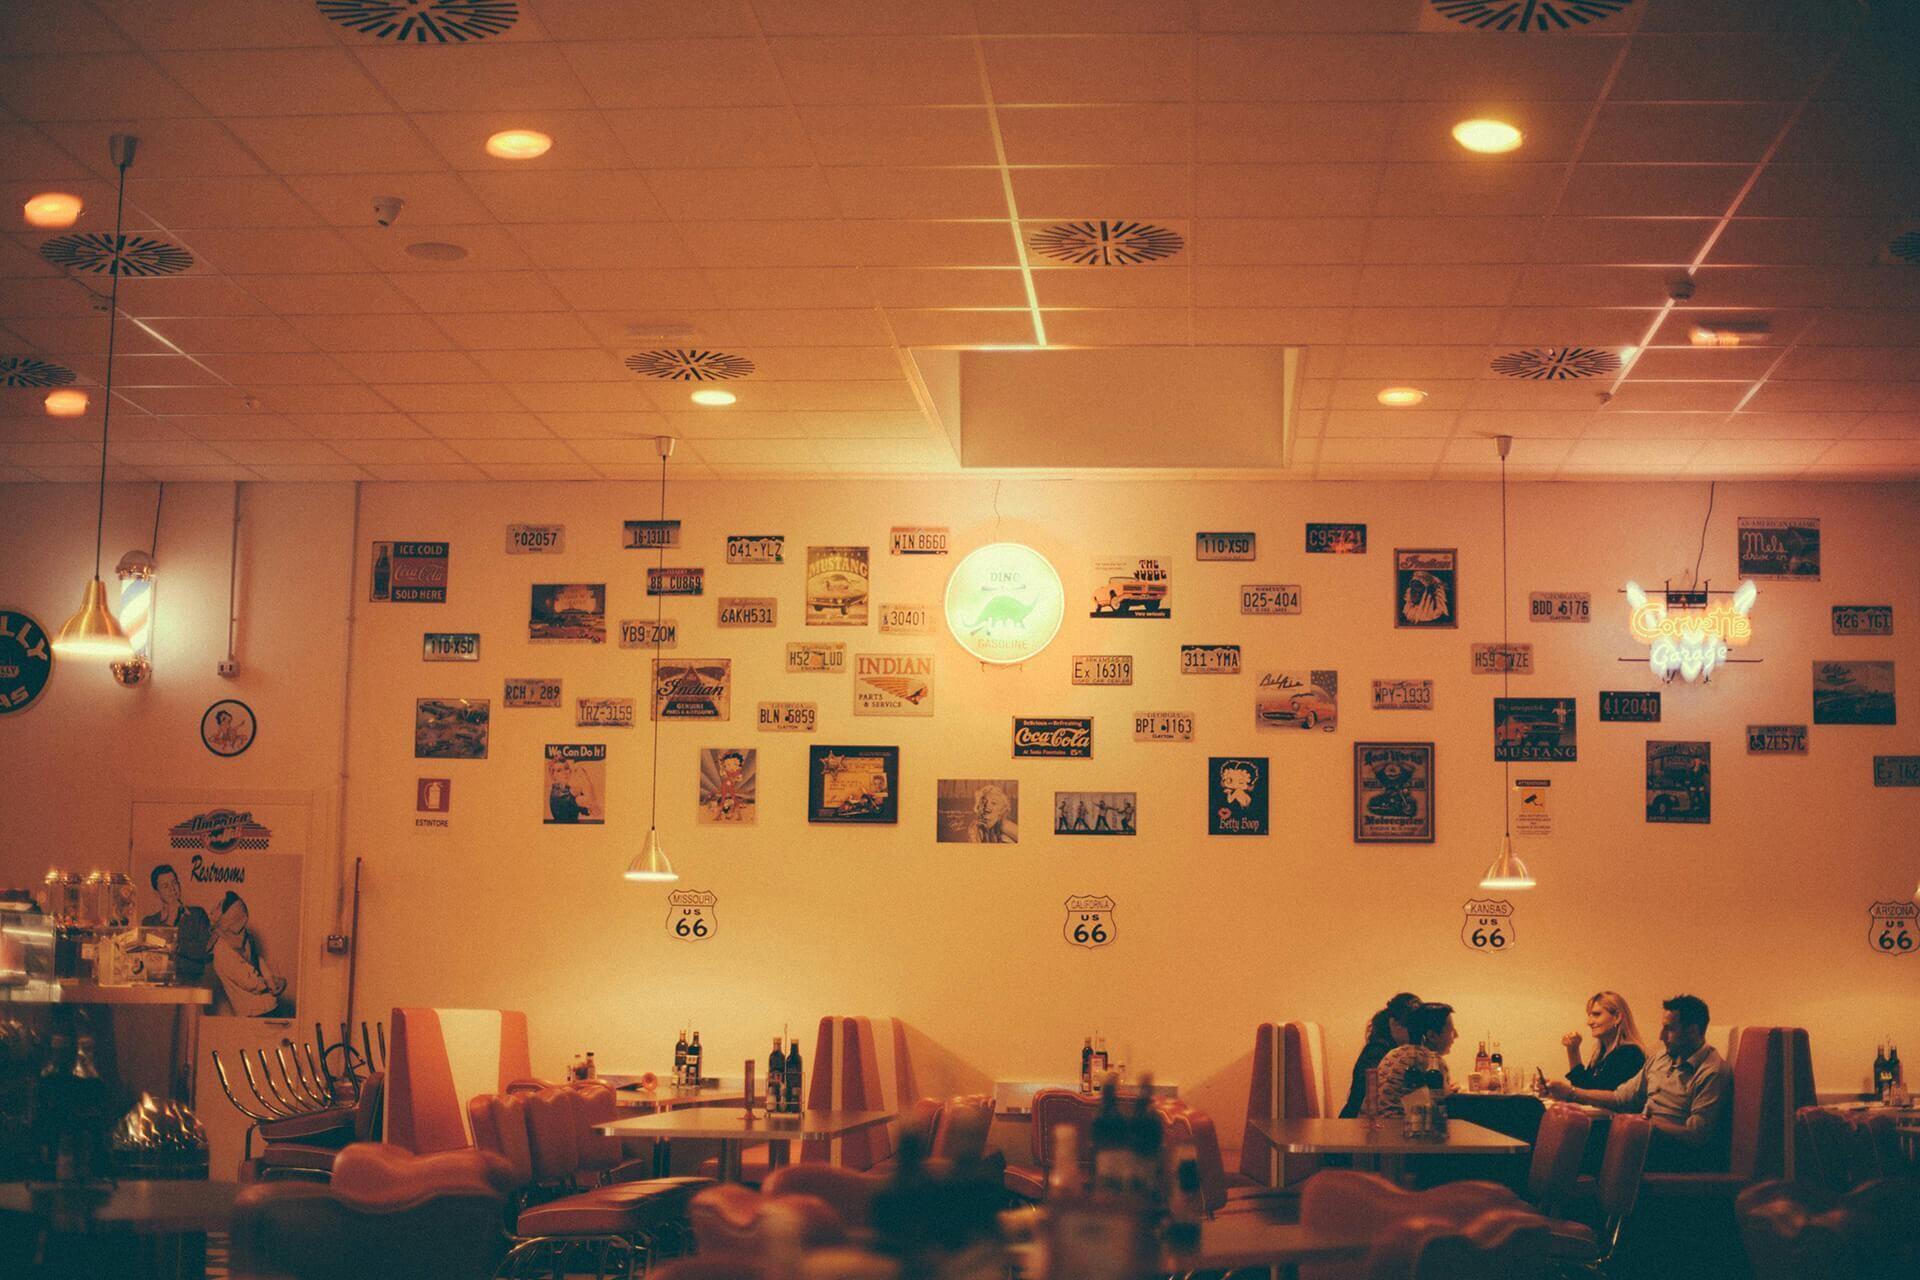 Vintage at the restaurant ... wallpaper